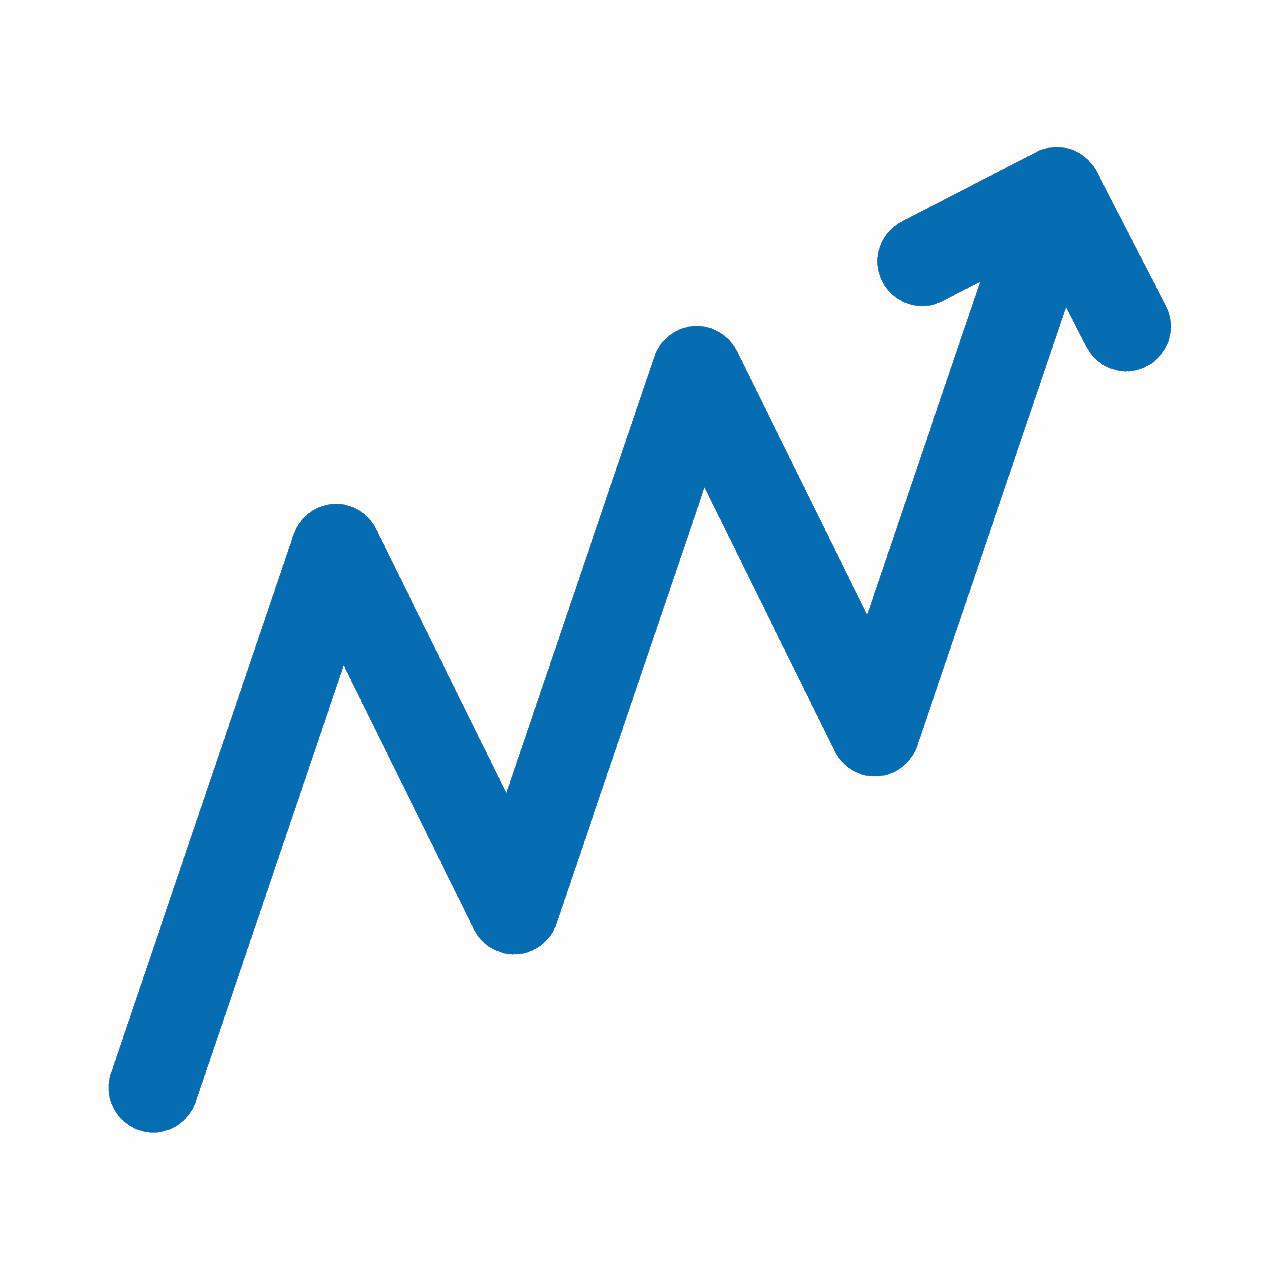 Risk management tools for social impact investors